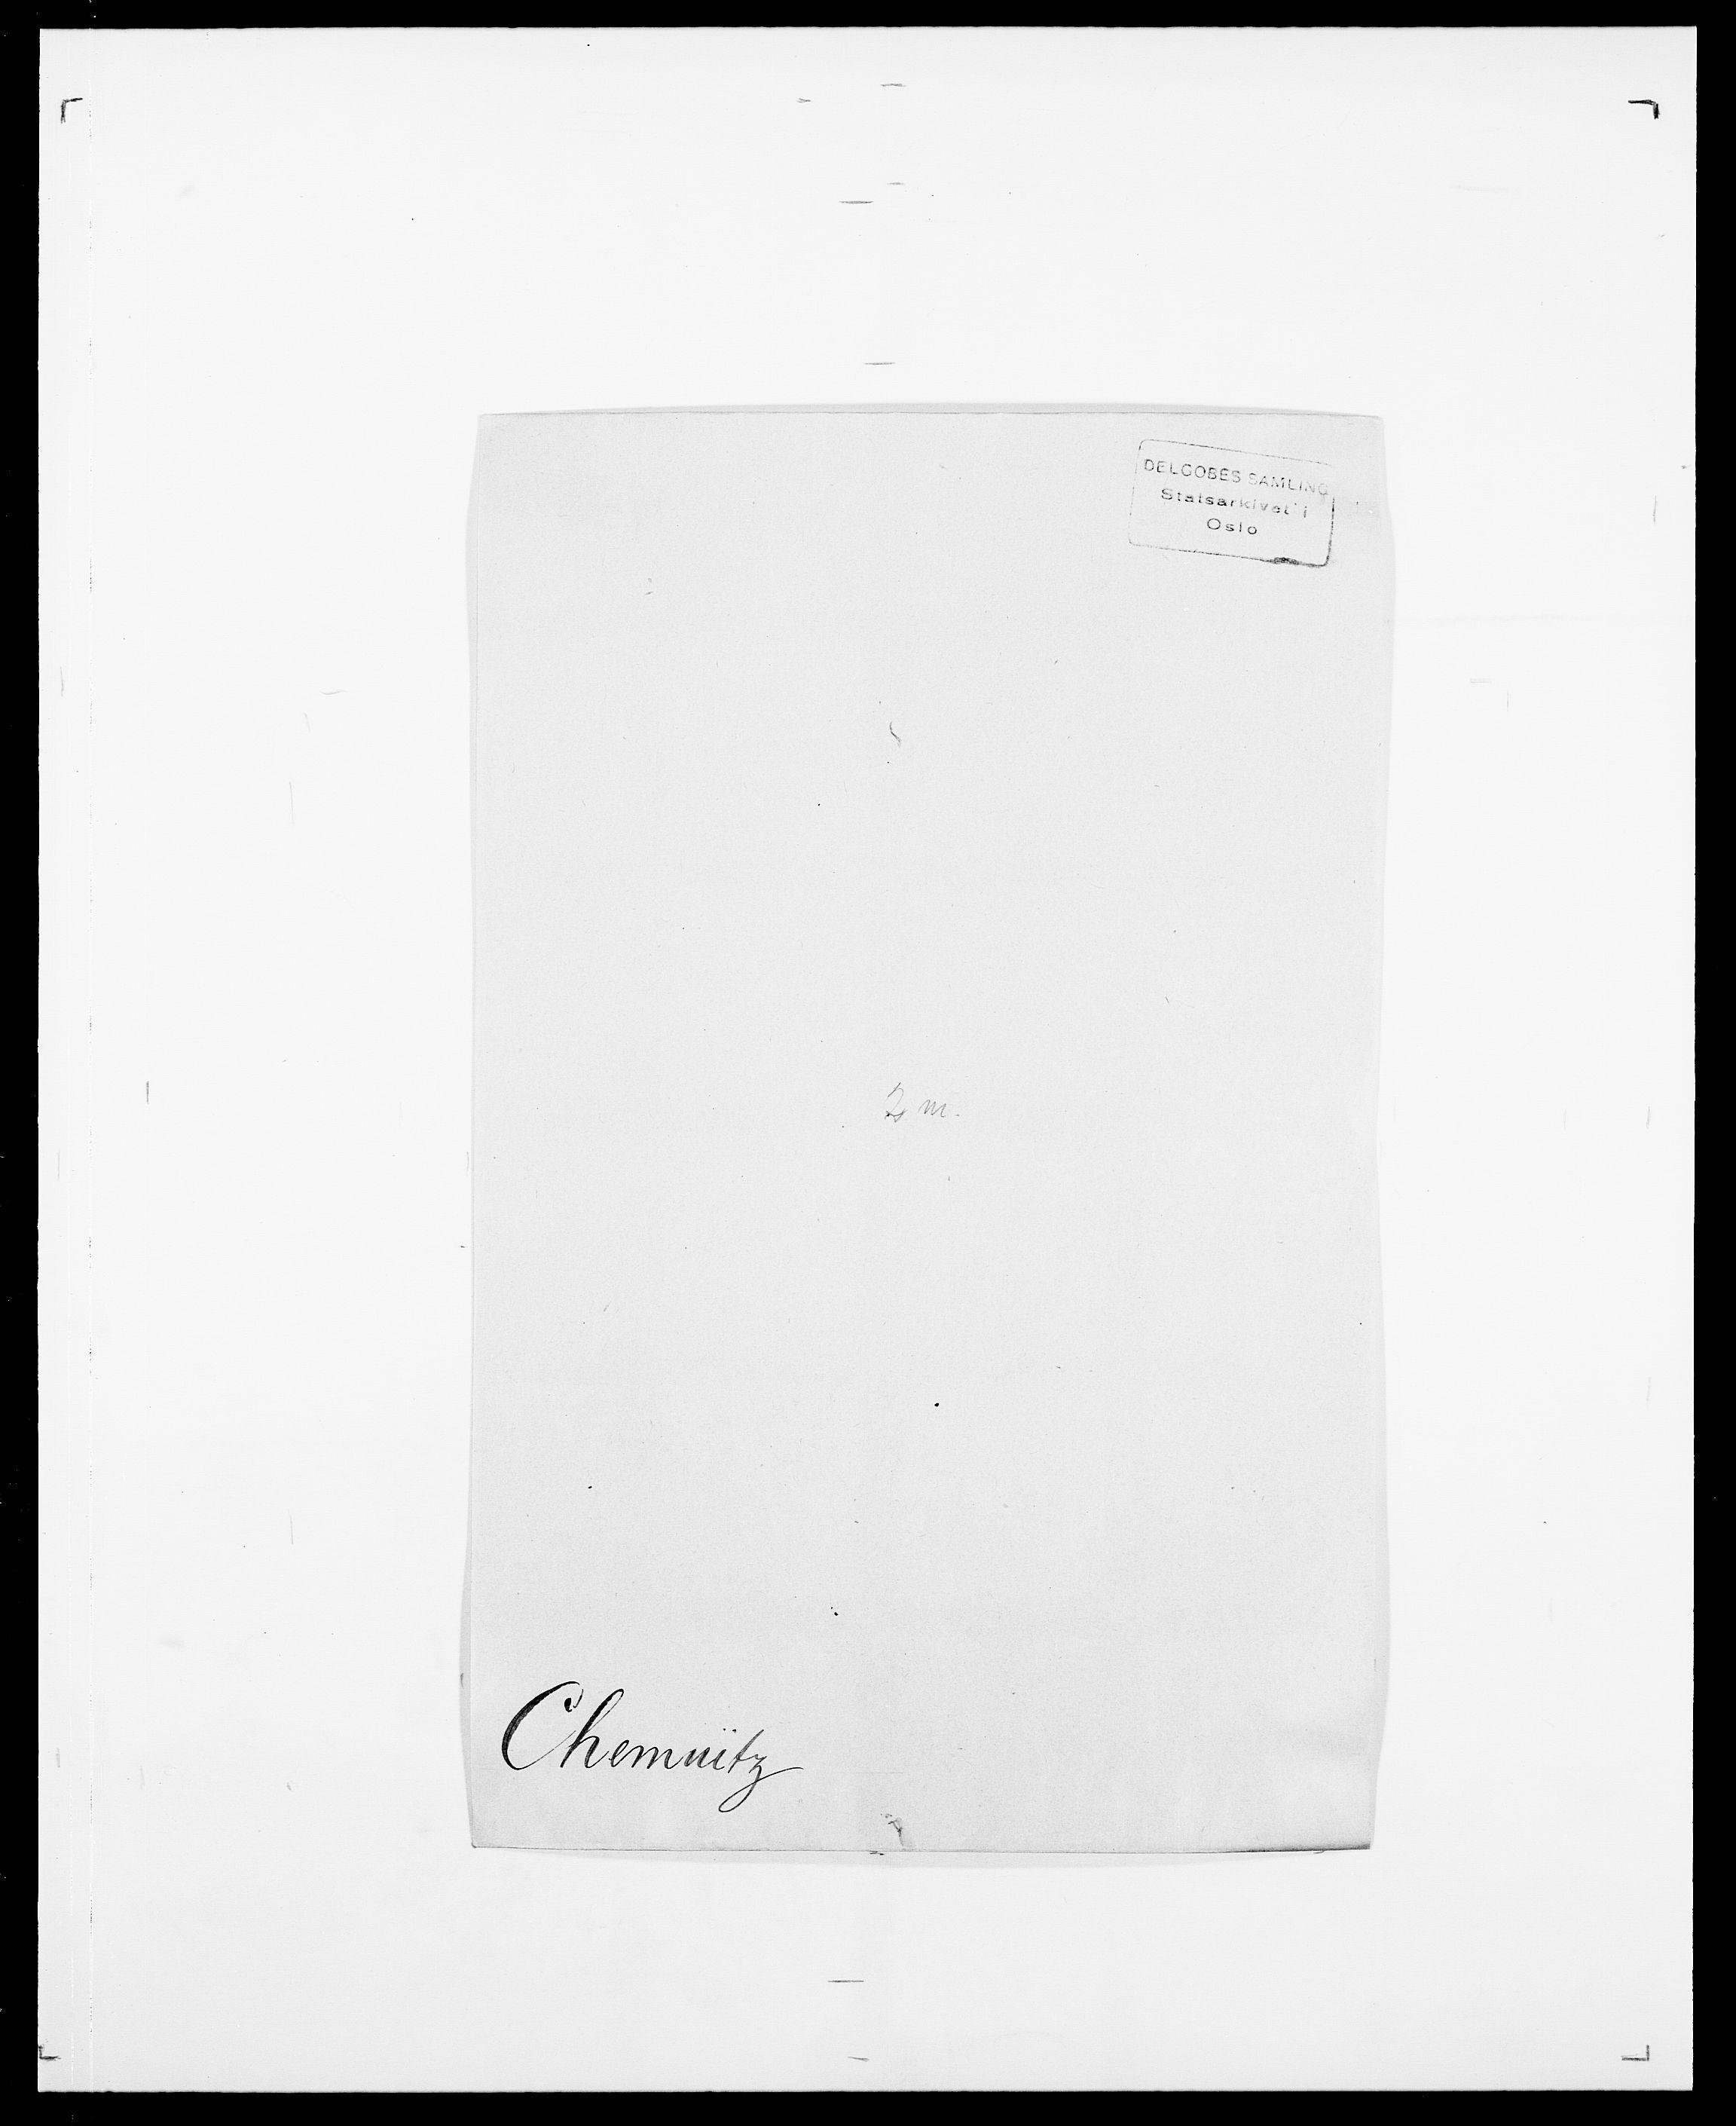 SAO, Delgobe, Charles Antoine - samling, D/Da/L0008: Capjon - Dagenbolt, s. 172